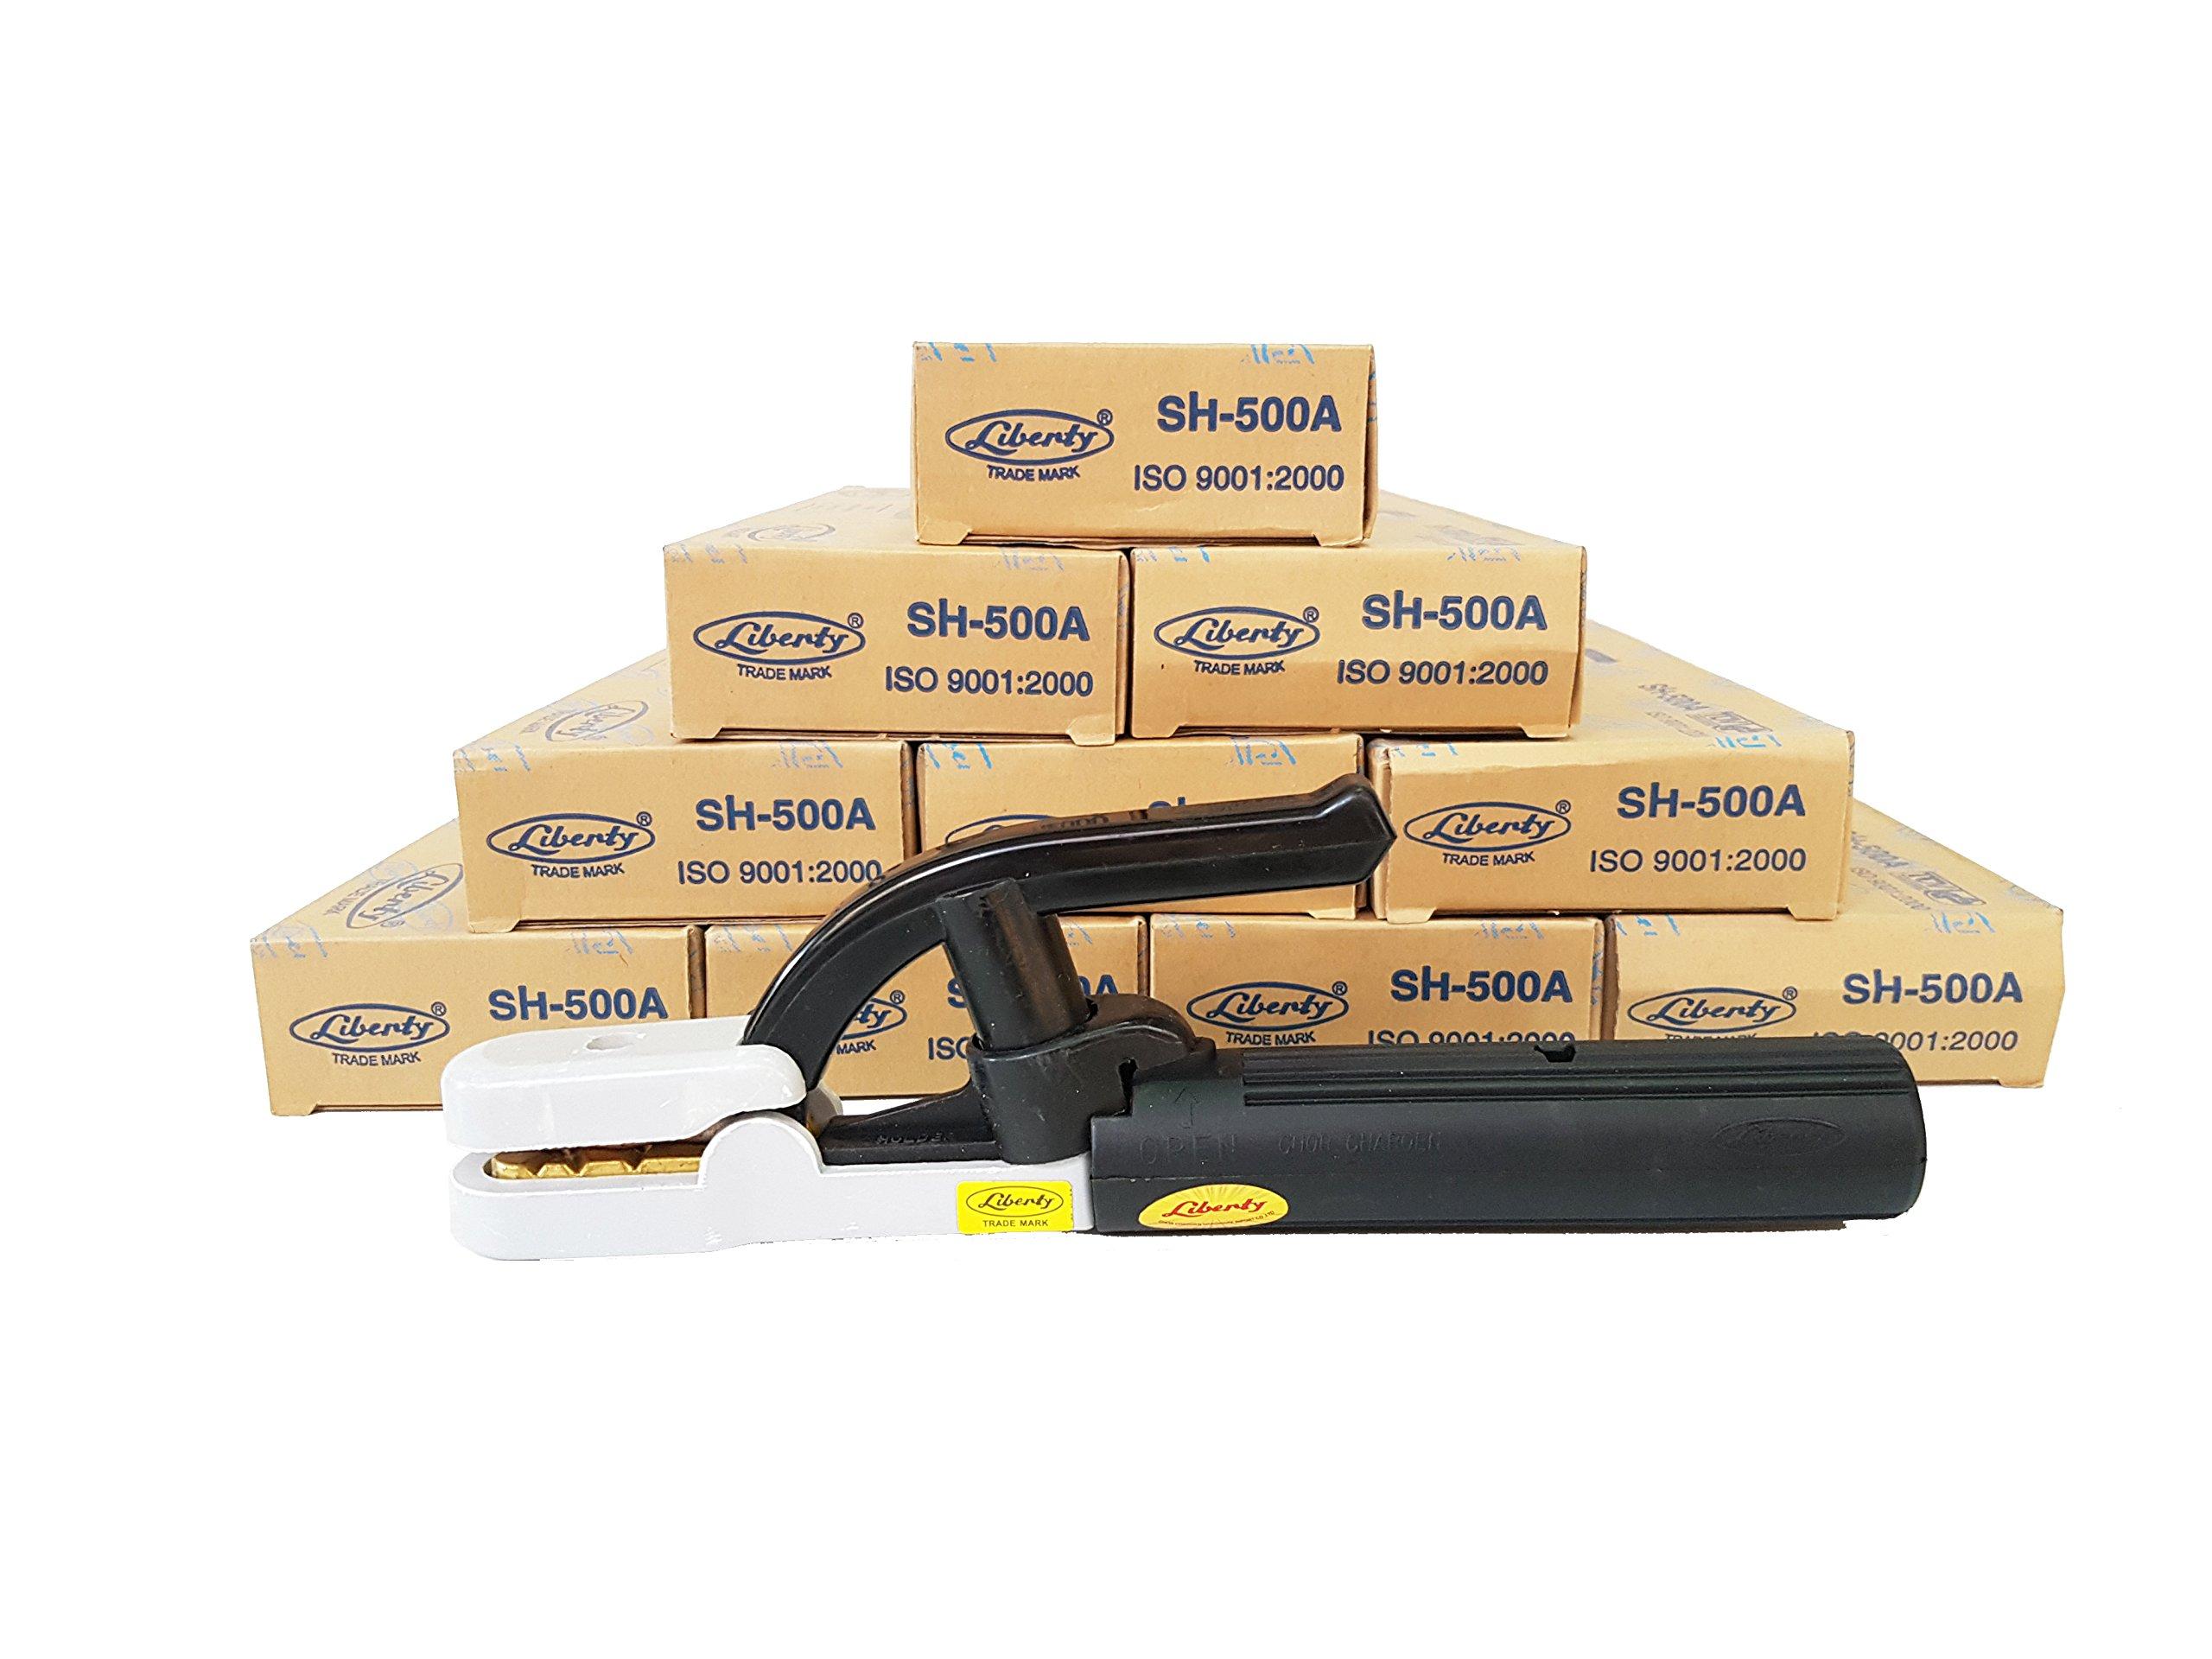 Prasertsteel LIBERTY VISE-GRIP Locking Welding Clamp Suntech 500A ( 10 Pack )